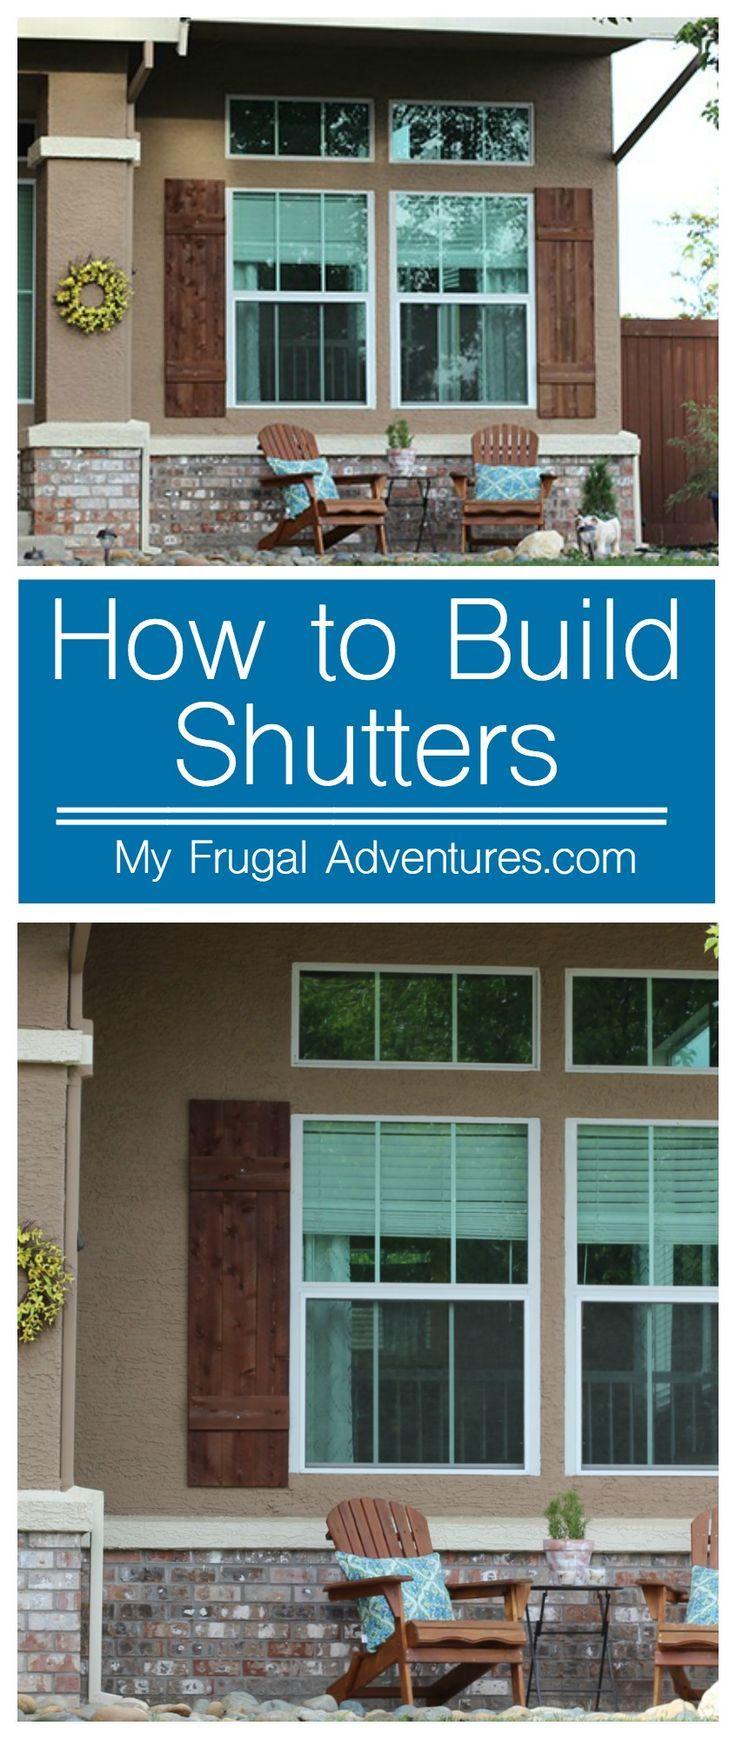 Bay window exterior shutters - How To Build Outdoor Shutters Diy Exteriorexterior Shuttersoutdoor Shutterswindow